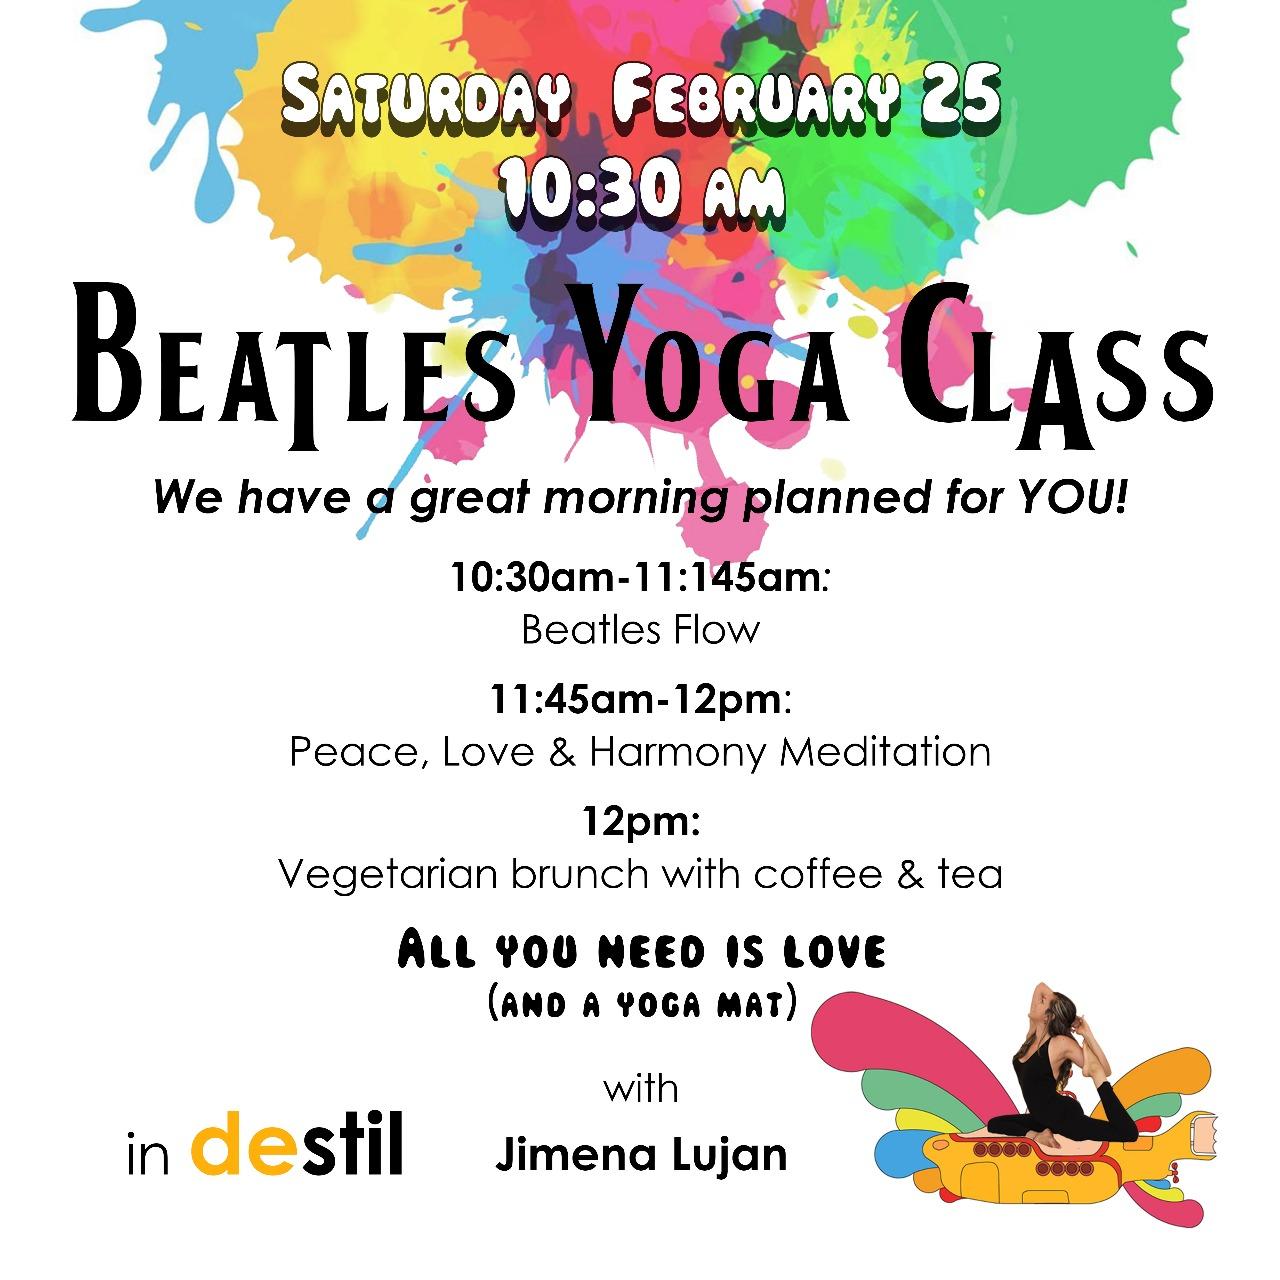 Beatles Yoga Class